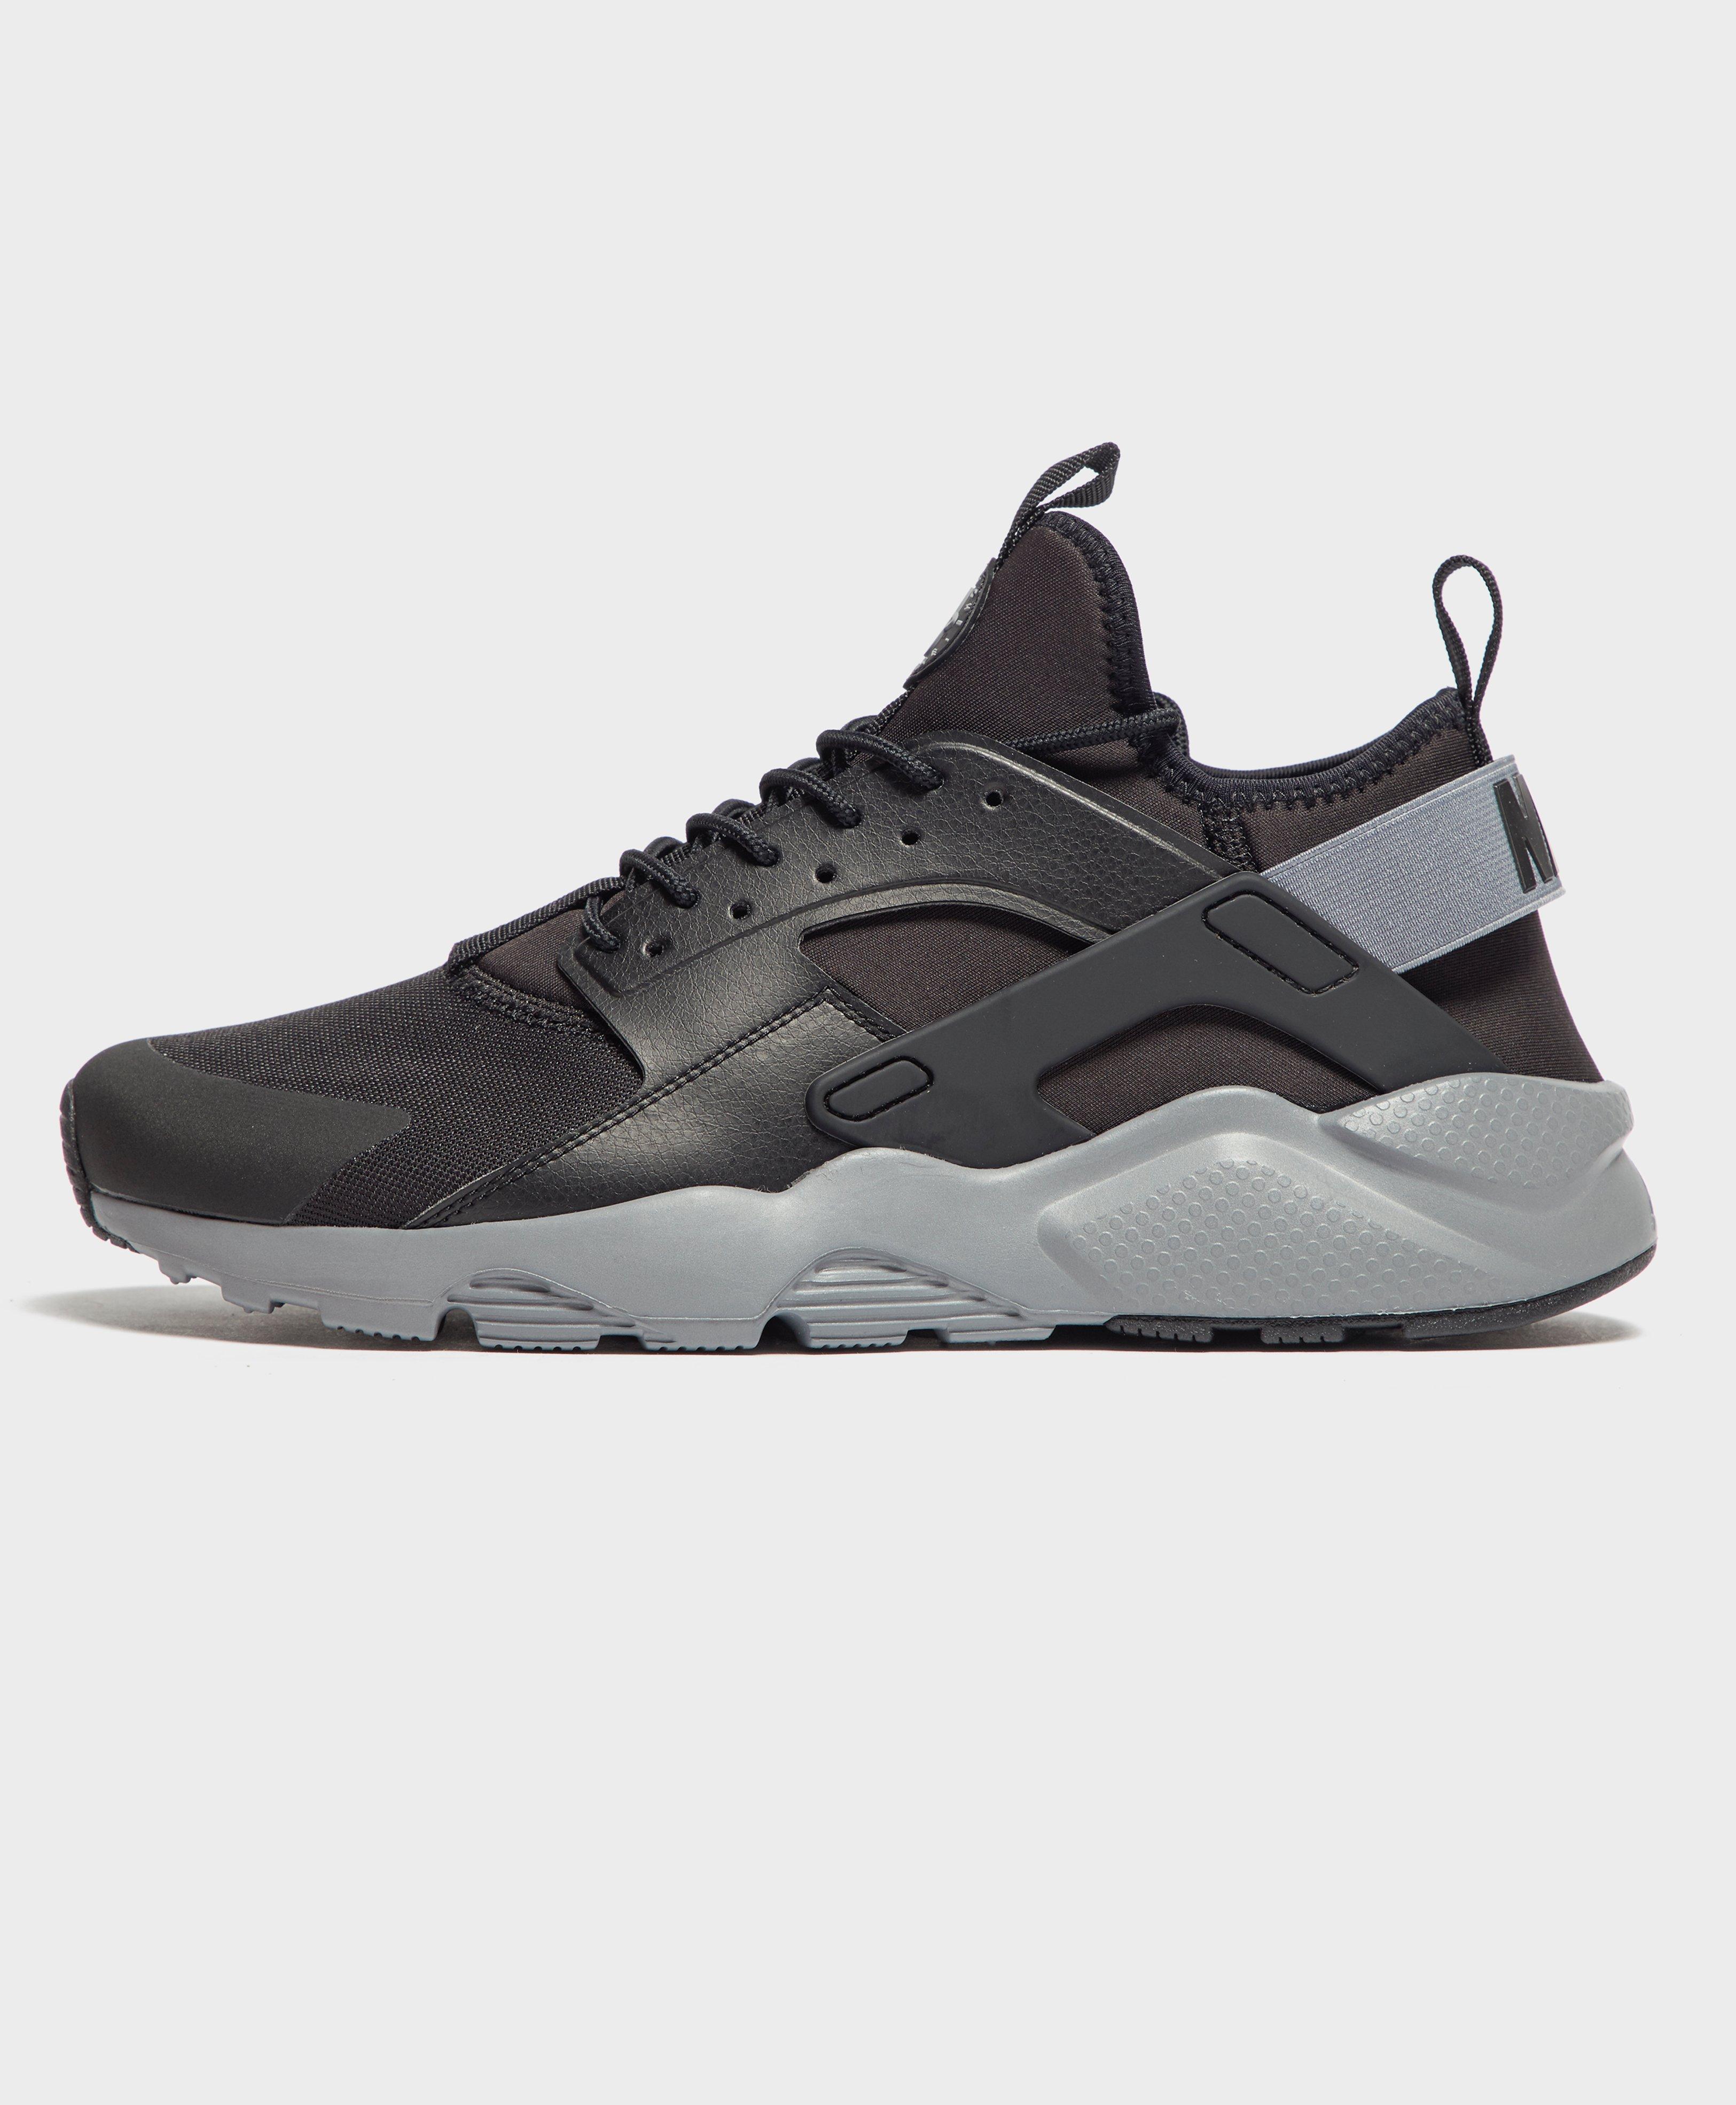 334559bb7b402c Lyst - Nike Air Huarache Ultra in Black for Men